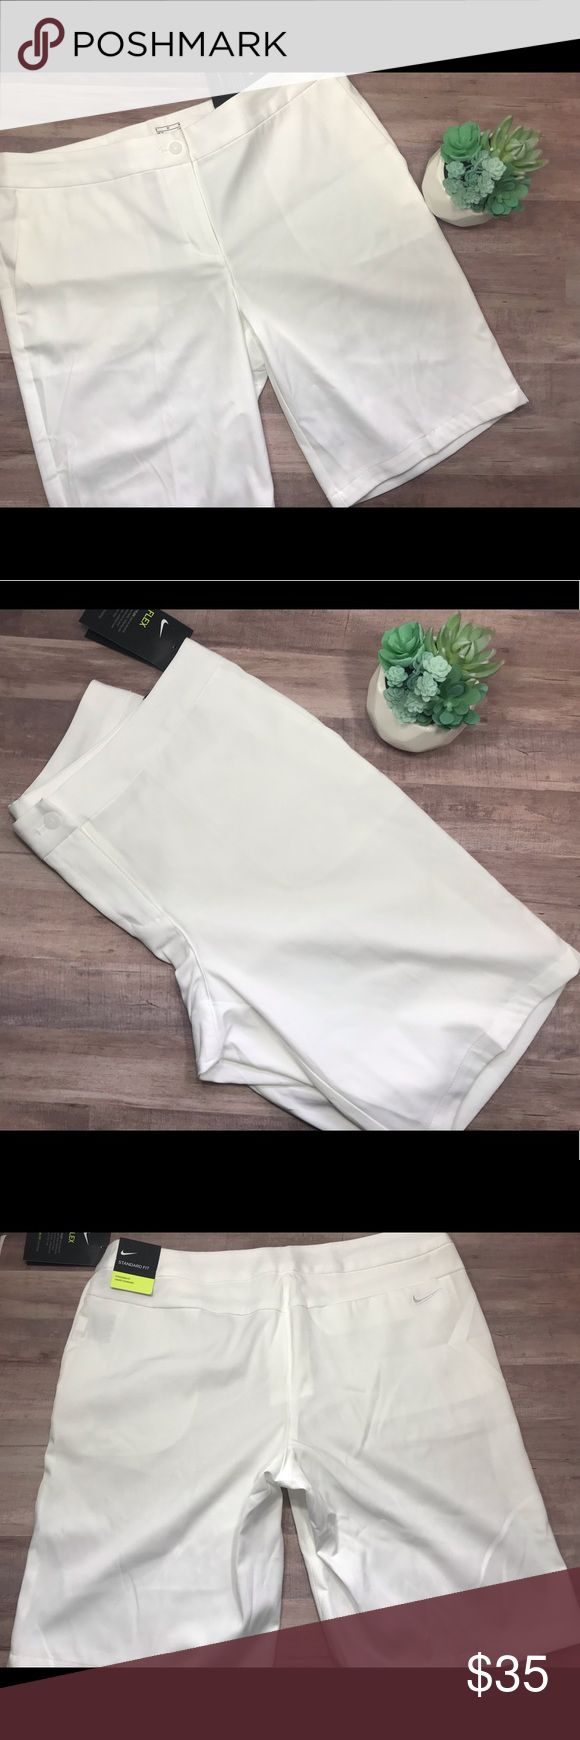 🆕NWT Nike Flex Dri Fit white shorts New with tags Nike Flex Dri Fit white sho…